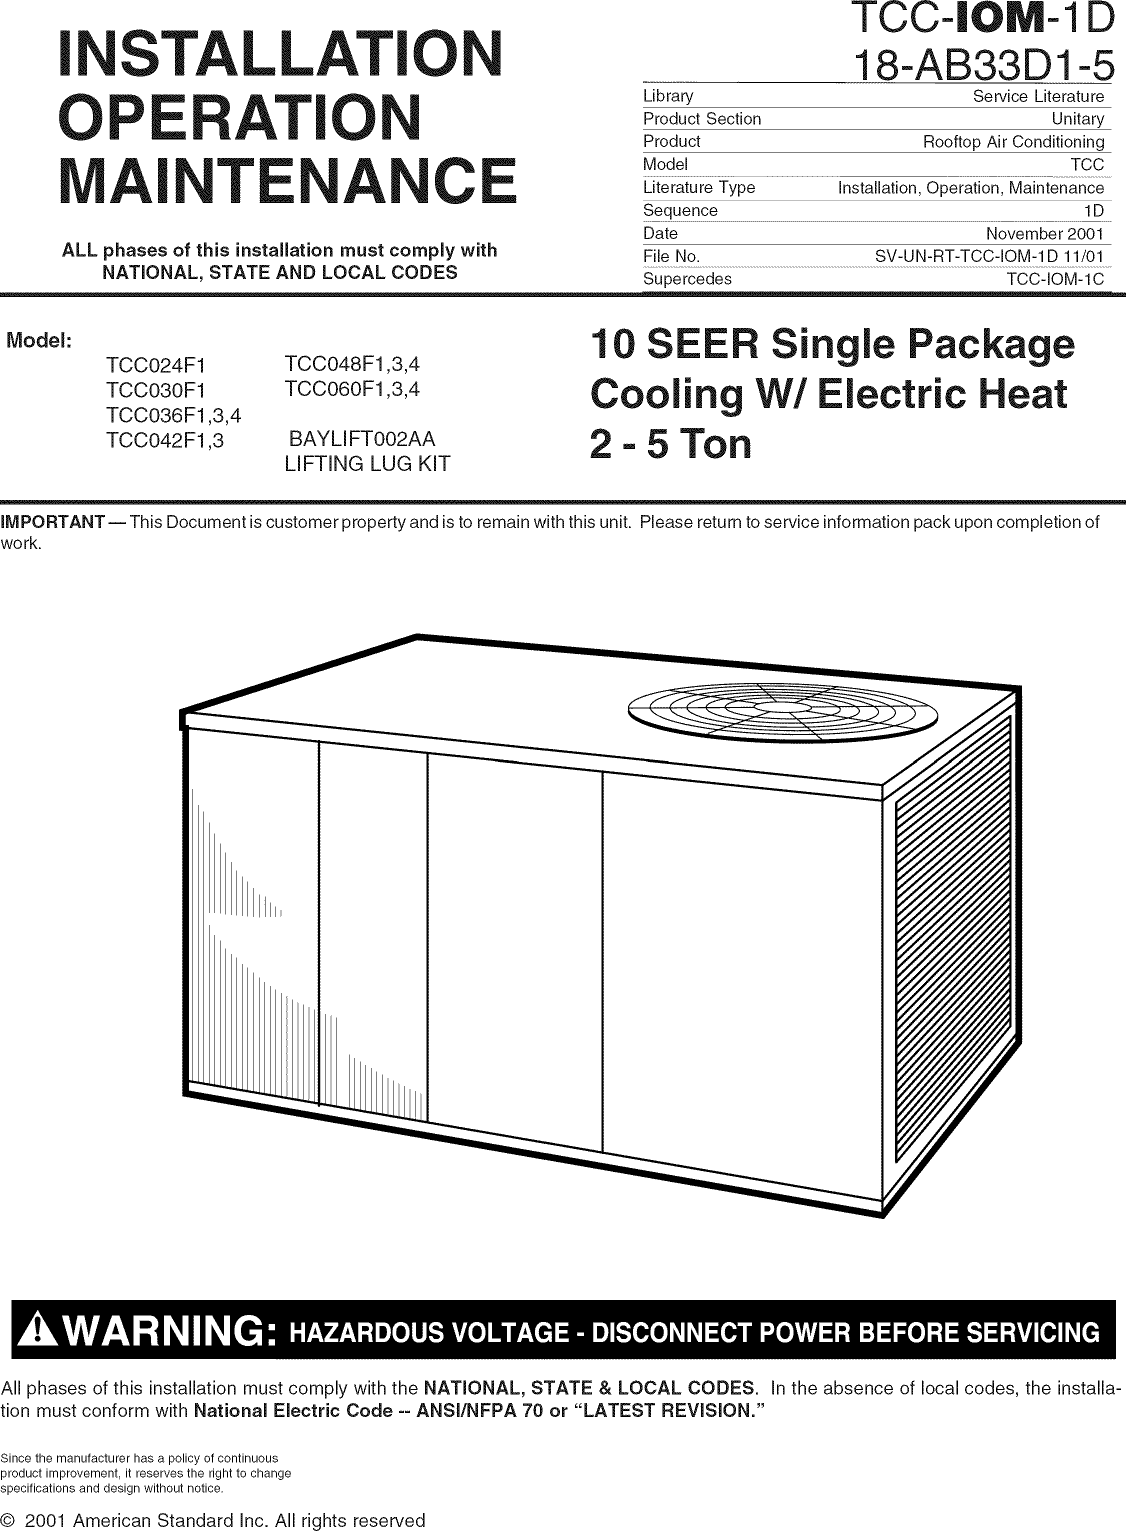 trane model 4tcc4060a1 operating manual